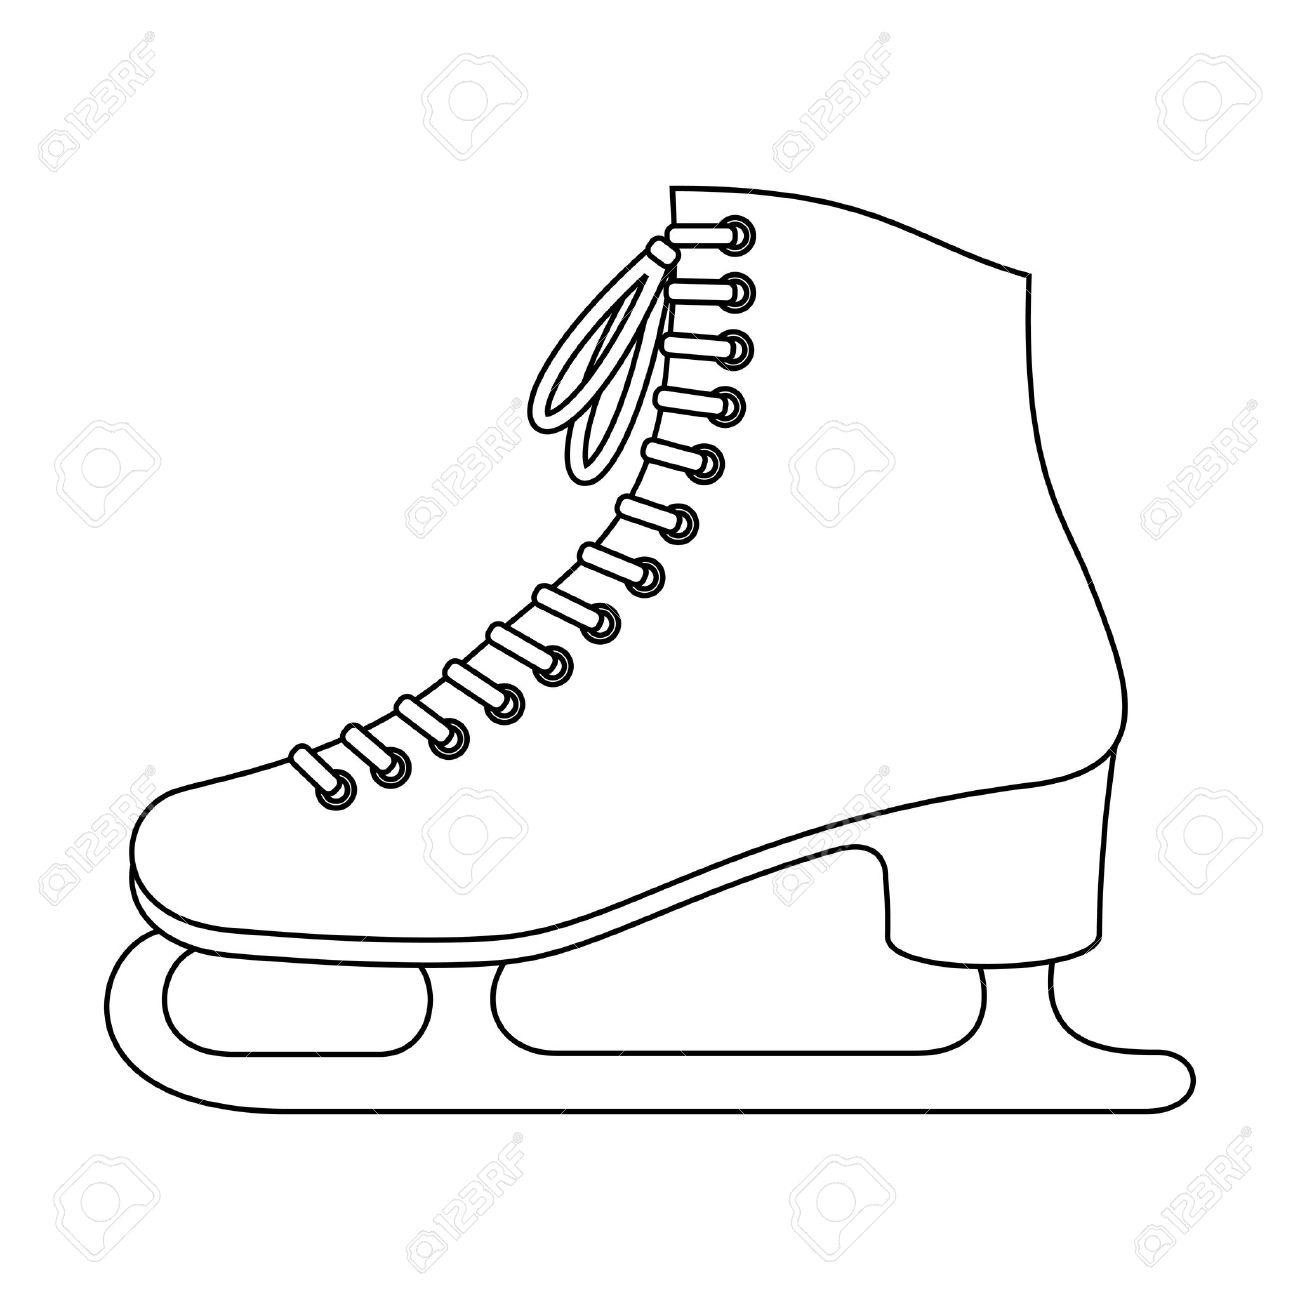 Ice skates Stock Vector - 15649433